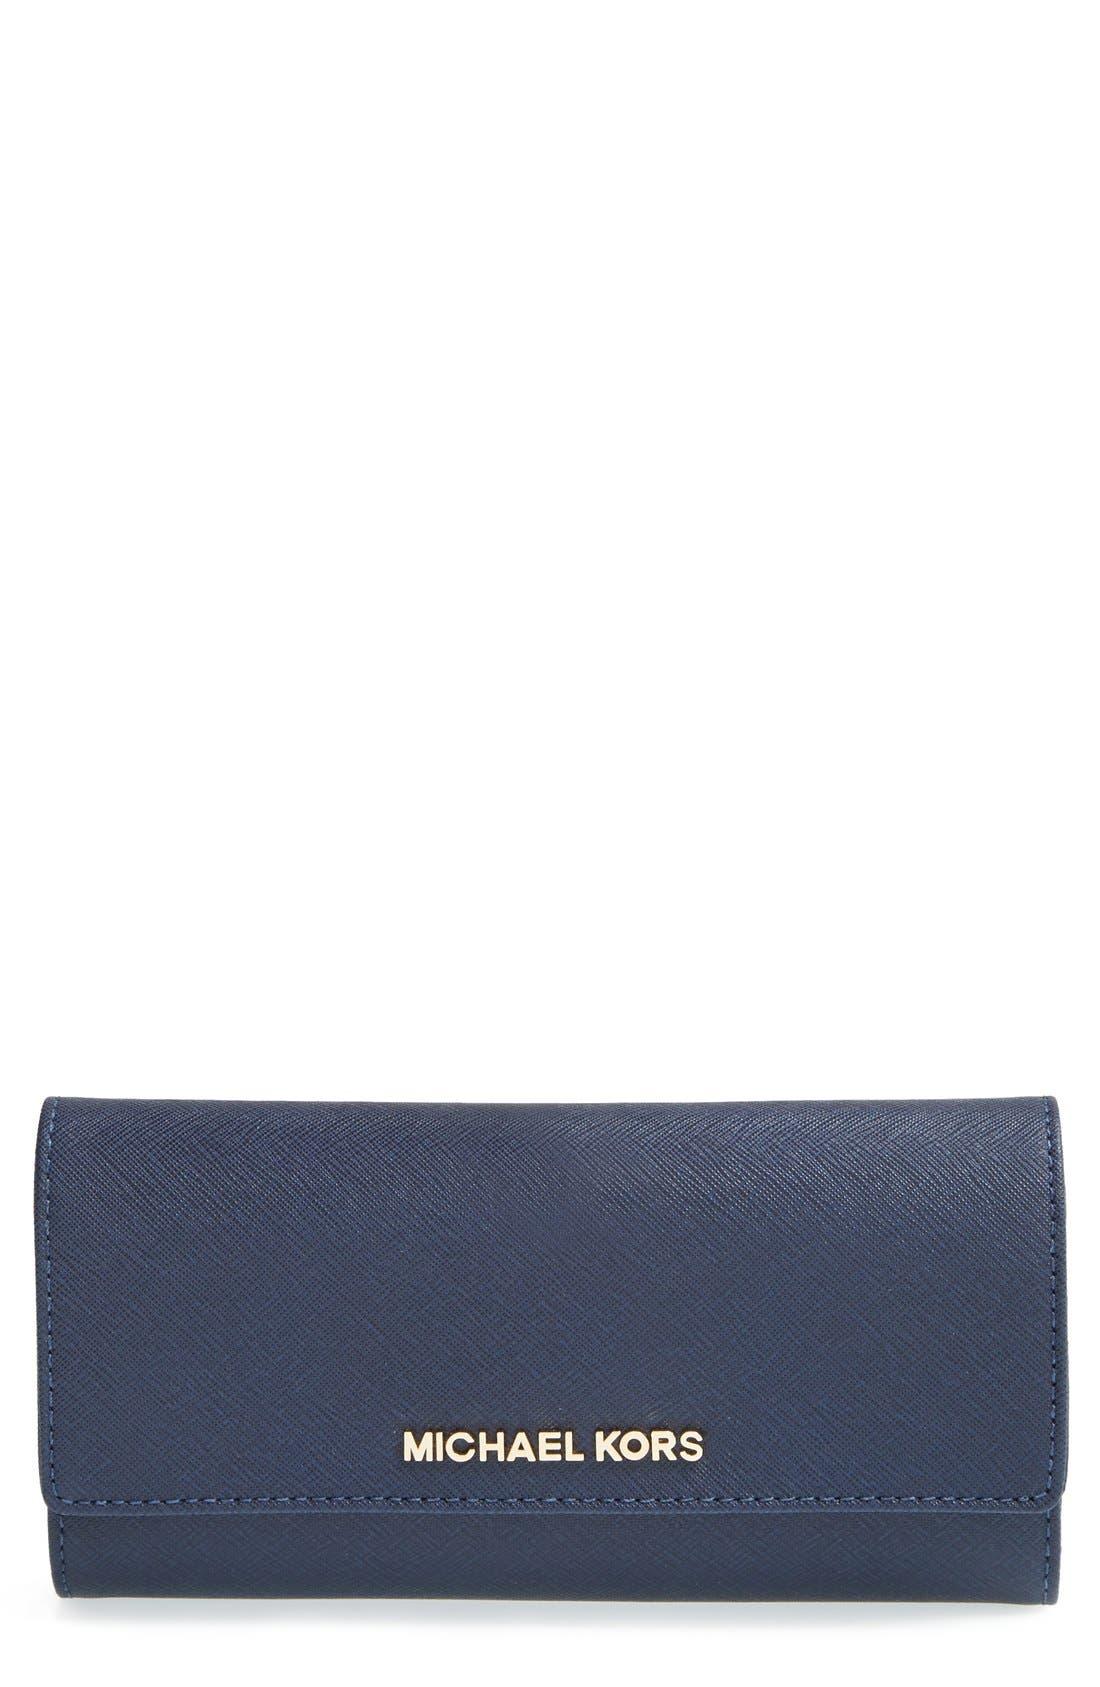 Alternate Image 1 Selected - MICHAEL Michael Kors 'Jet Set' Saffiano Leather Checkbook Wallet